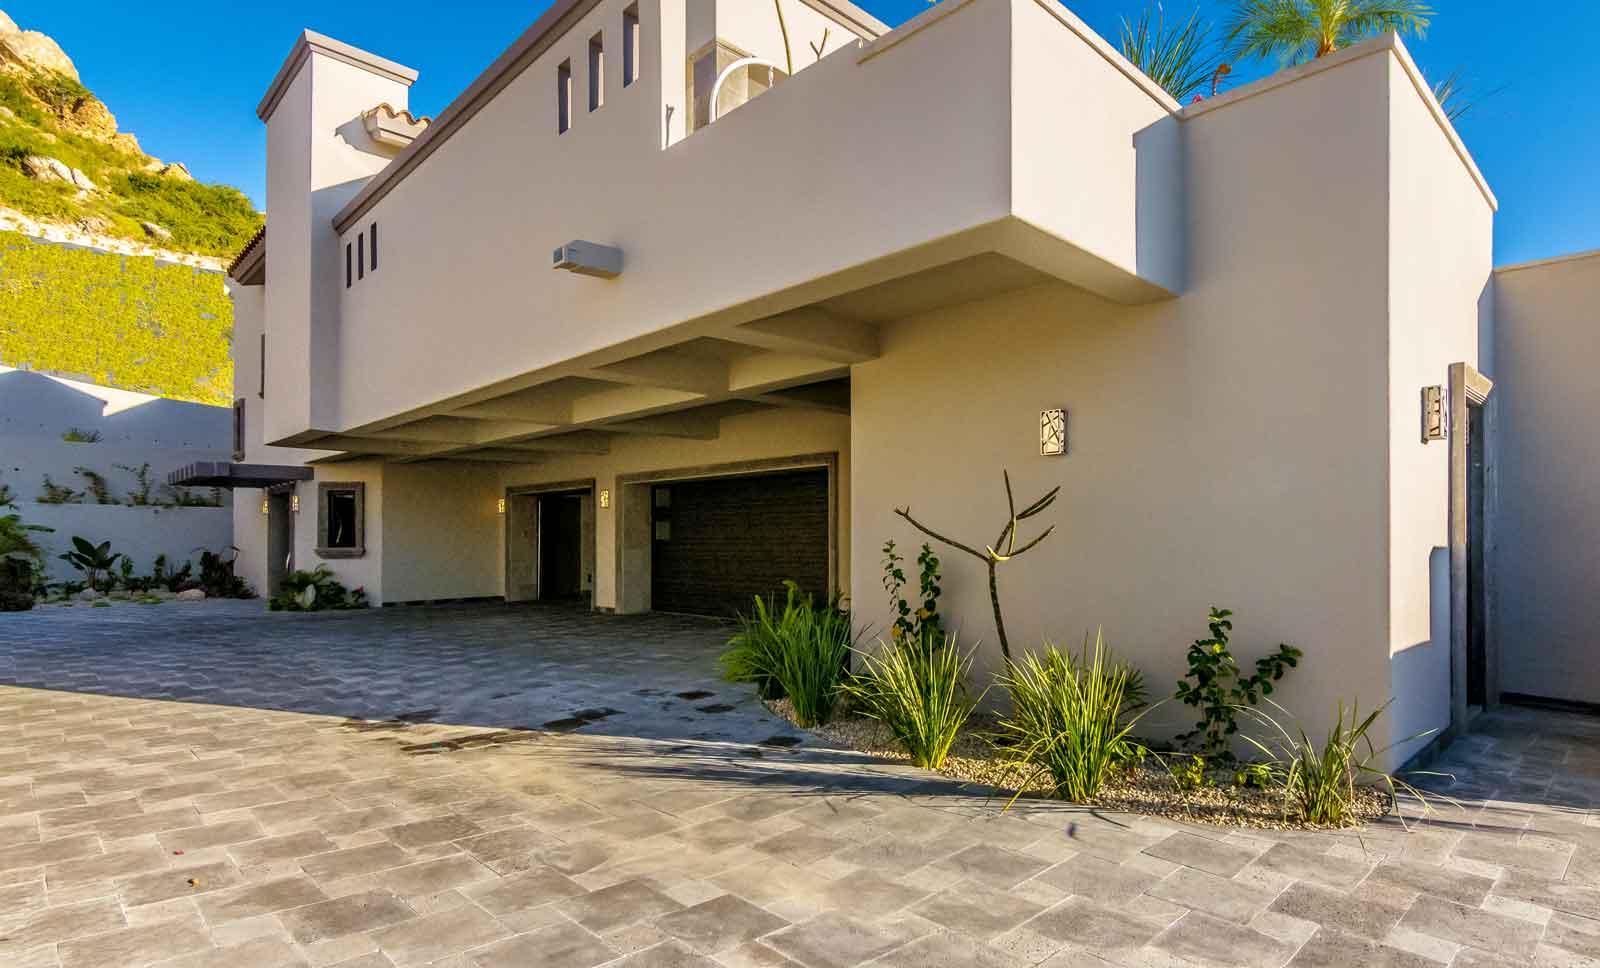 San Jose del Cabo, 4 Bedrooms Bedrooms, ,4 BathroomsBathrooms,House,For Sale,115 Avenida Padre Salvatierra,20-577